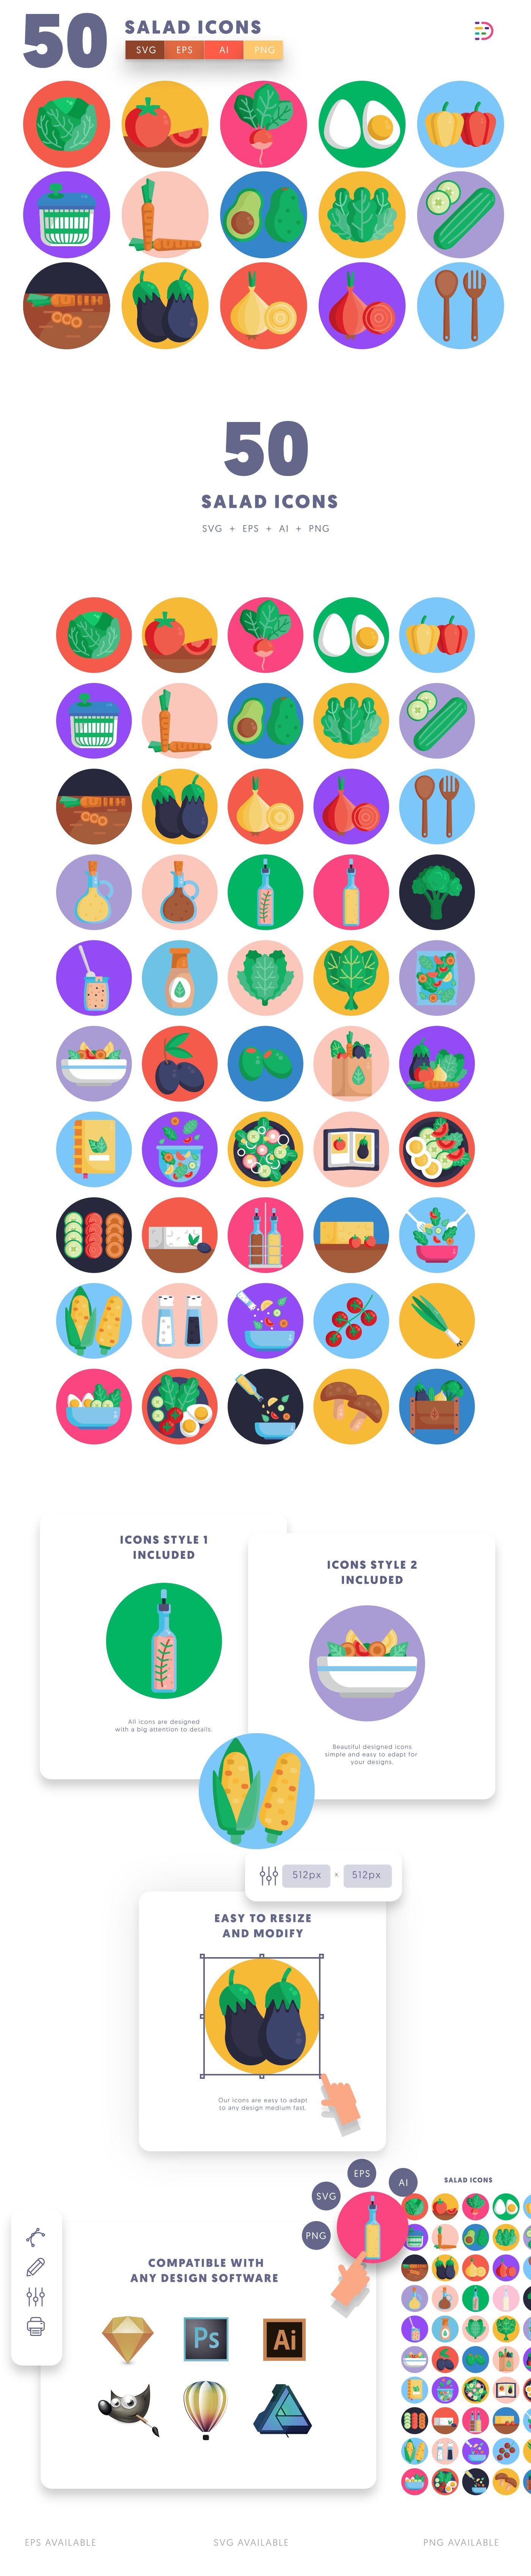 Salad icons info graphic